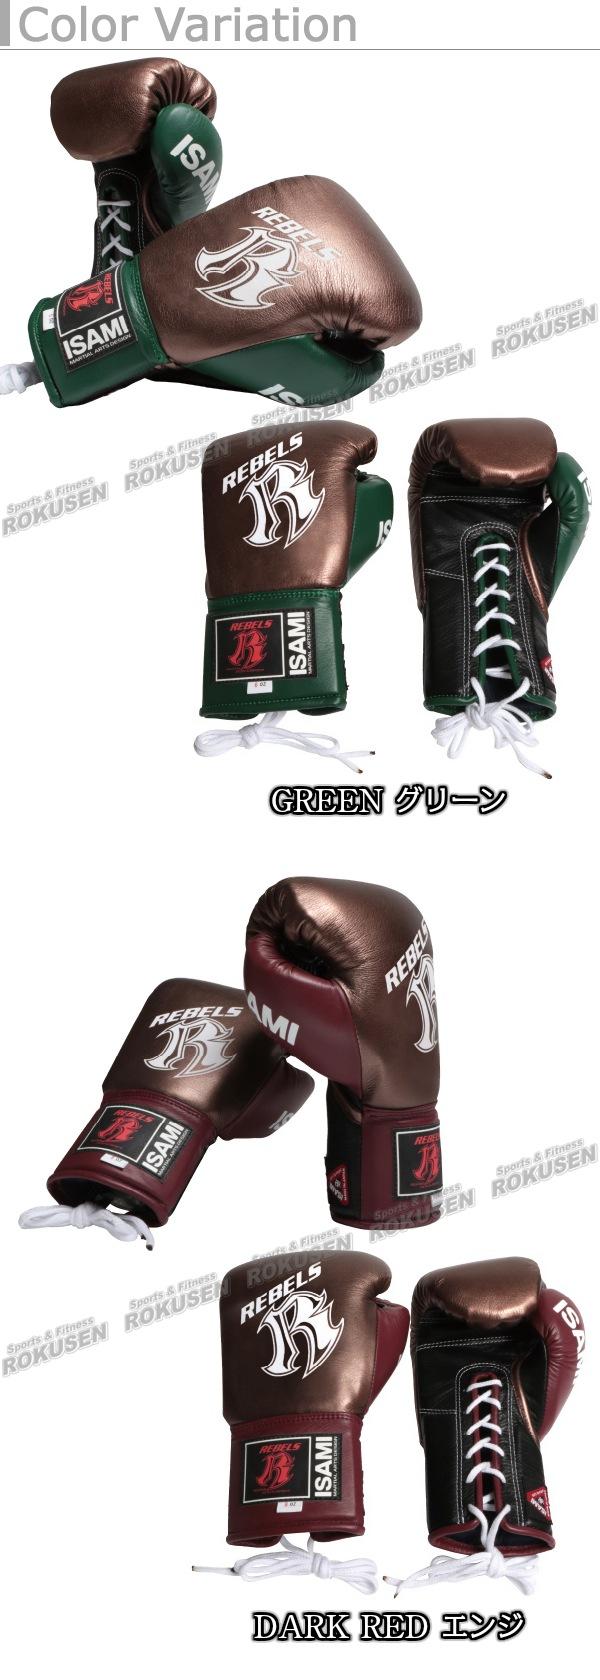 【ISAMI・イサミ】ボクシンググローブ REBELSグローブ ひも式 RB-001(RB001) 8オンス/16オンス